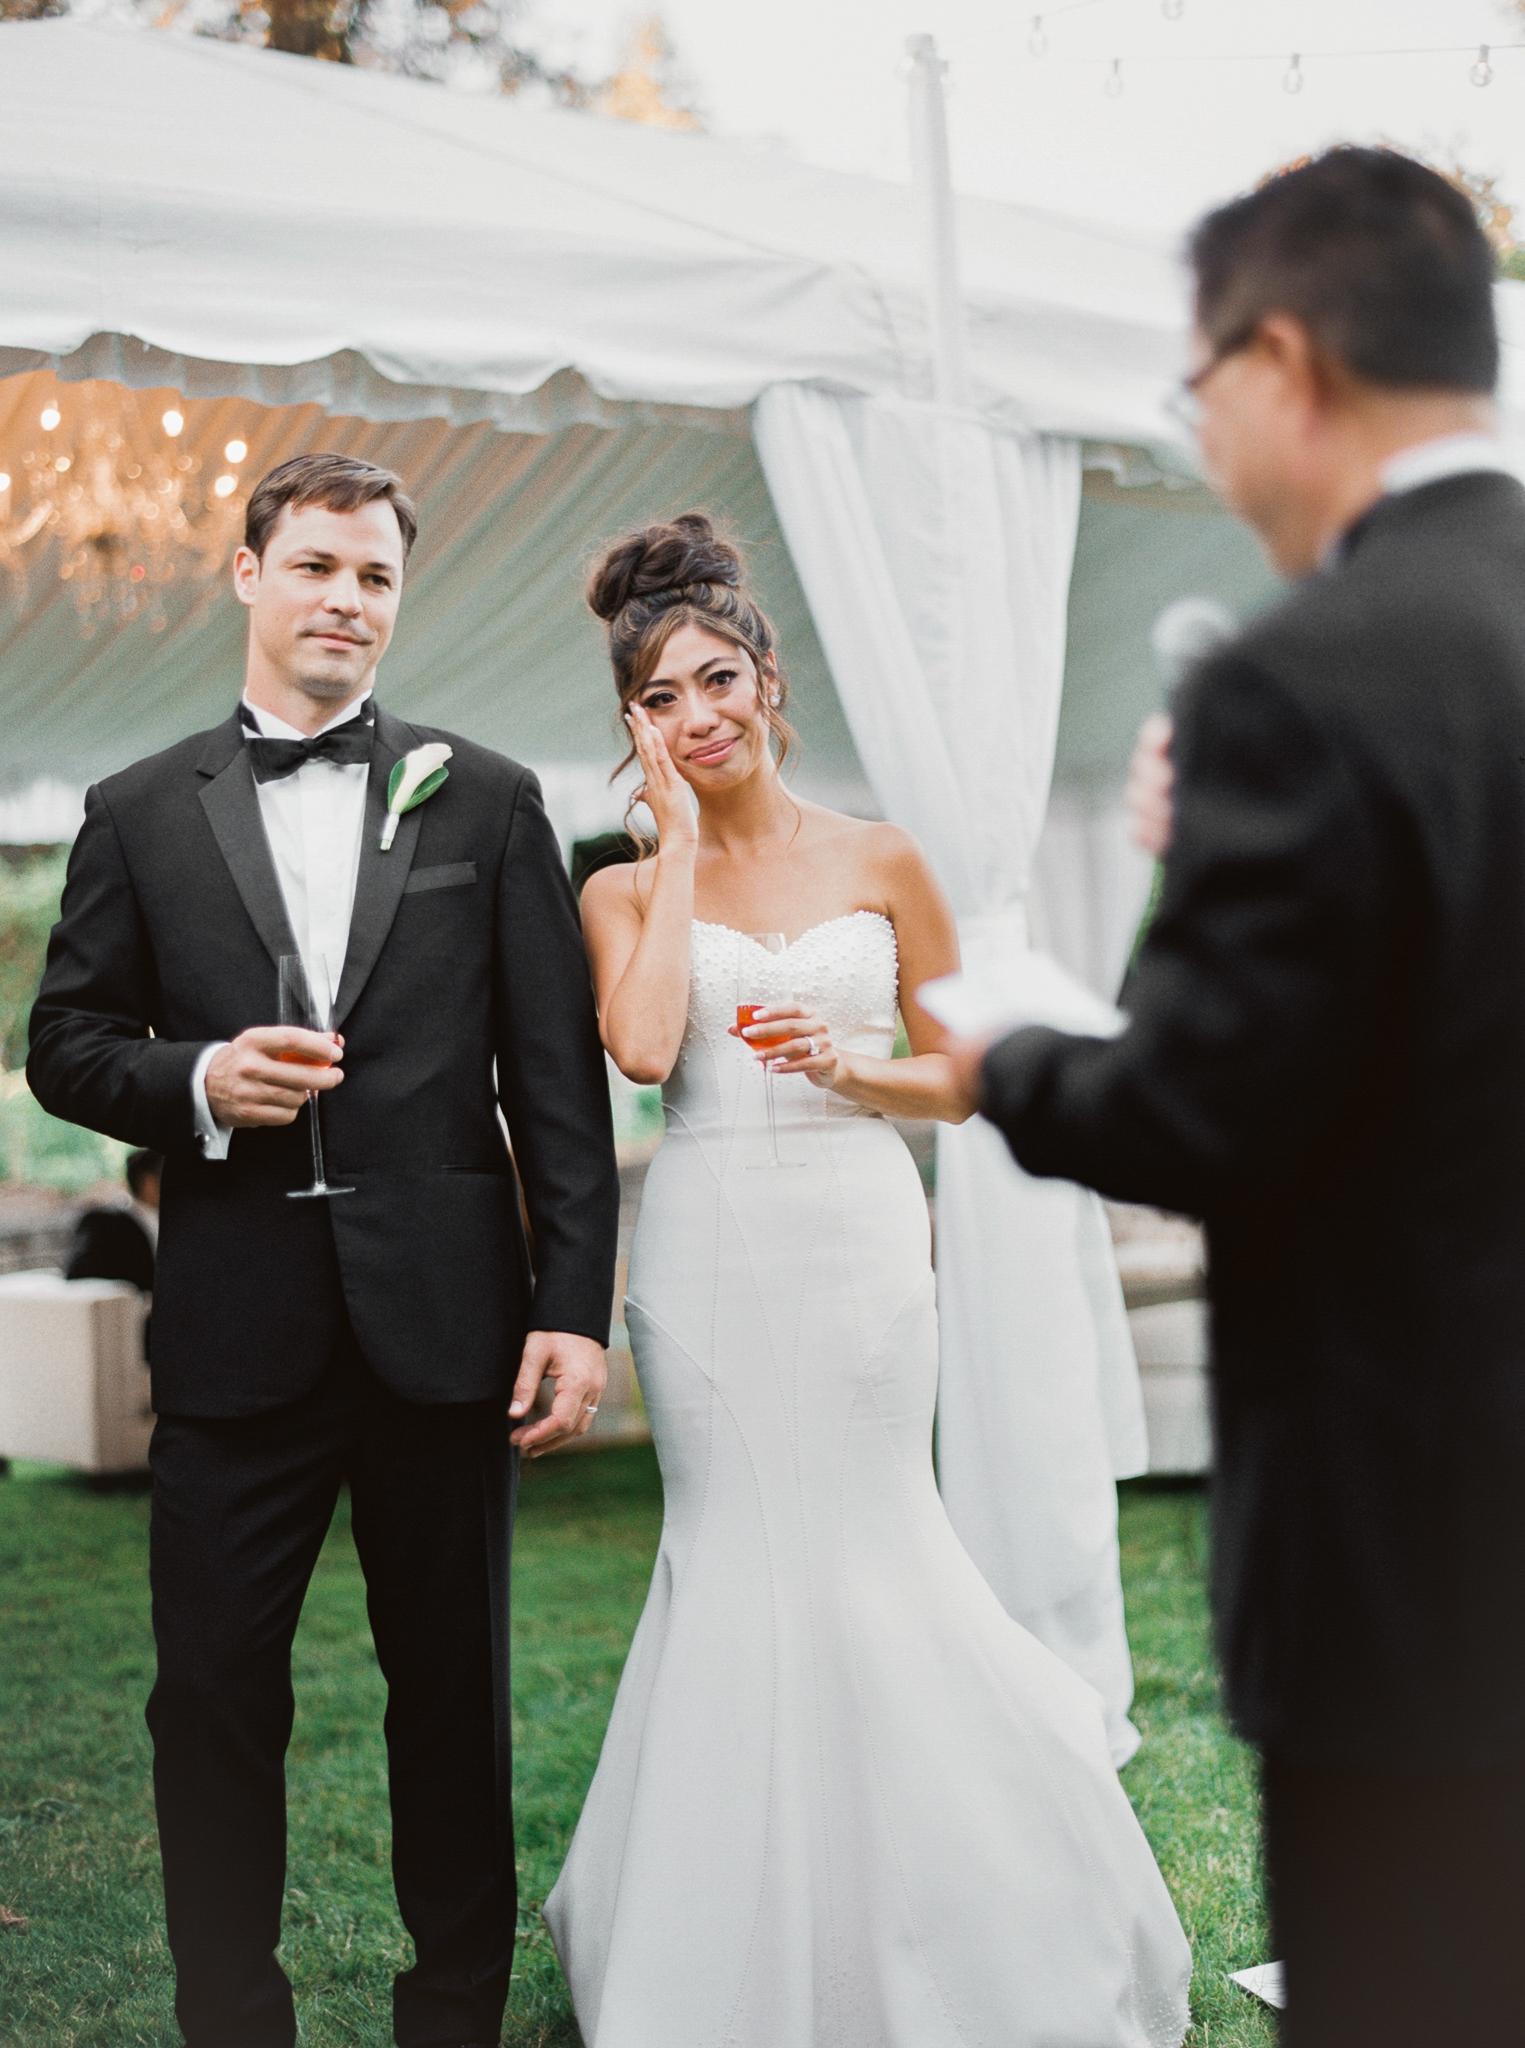 203OutliveCreative_Travel_Photographer_Videographer_Lewis&Clark_Oregon_Elegant_BlackTie_Destination_Wedding.jpg